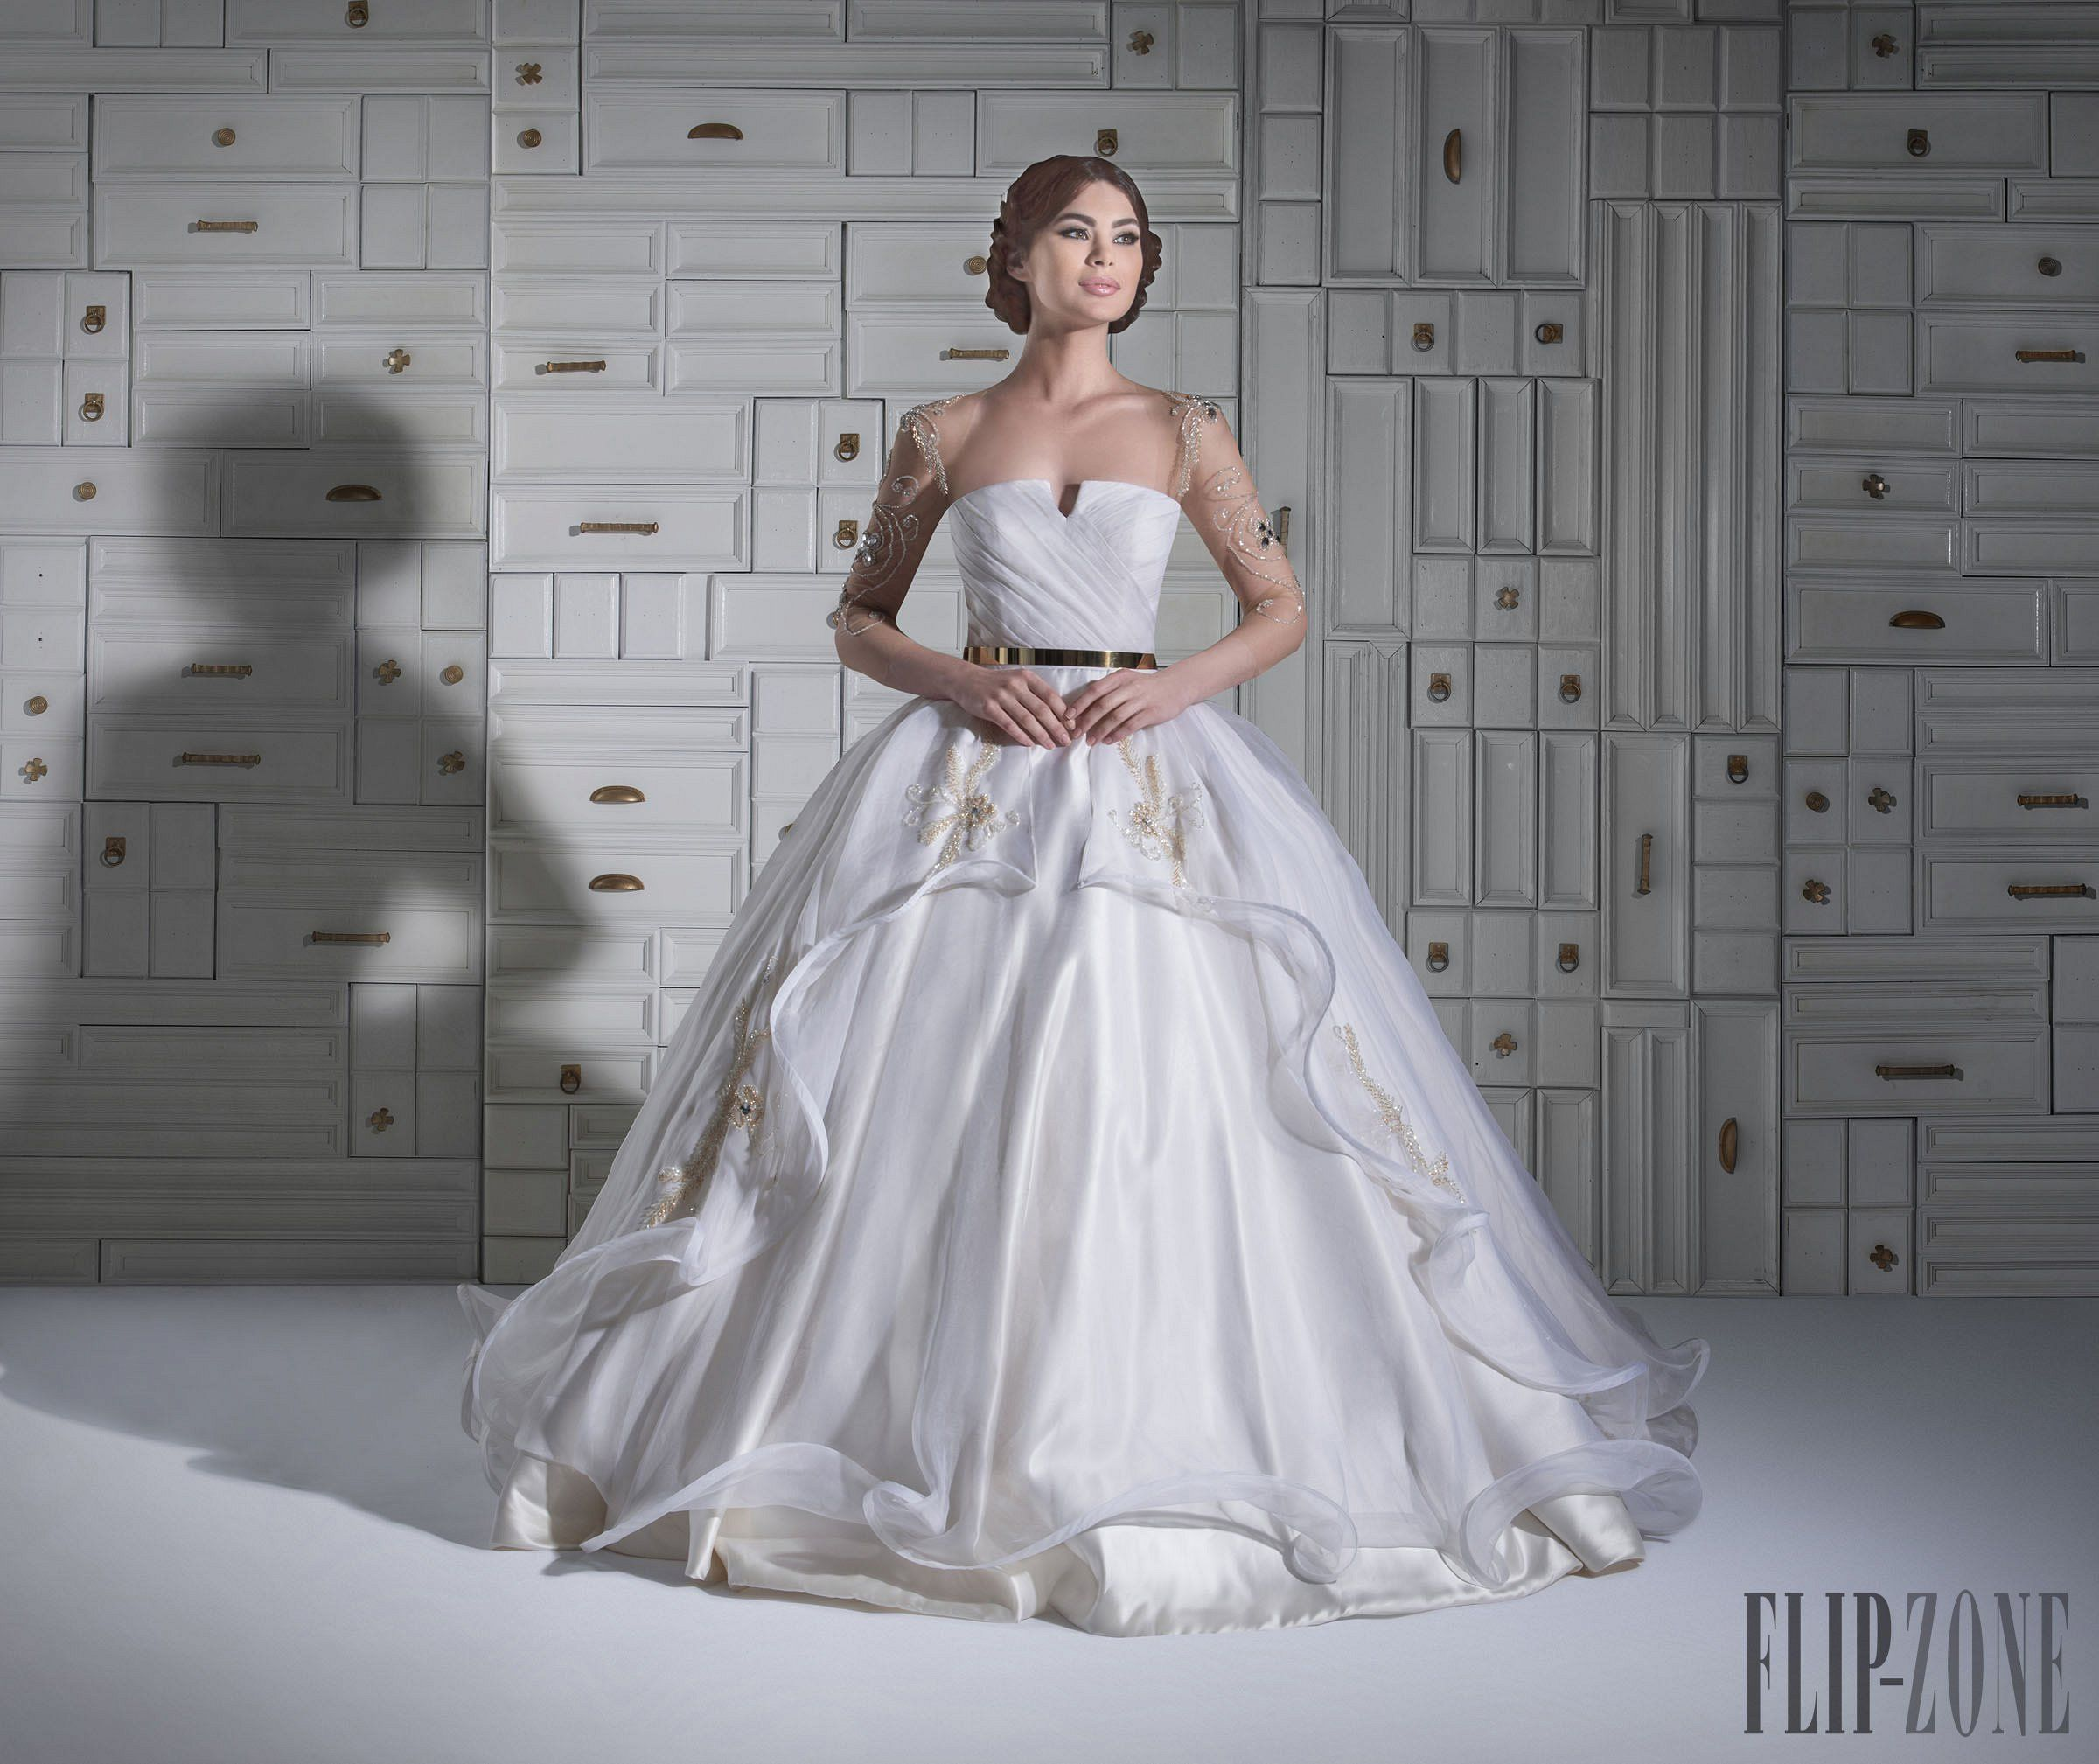 Cinderella inspired wedding dress  Chrystelle Atallah  collection  Bridal  FASHION WEDDING LOOKS